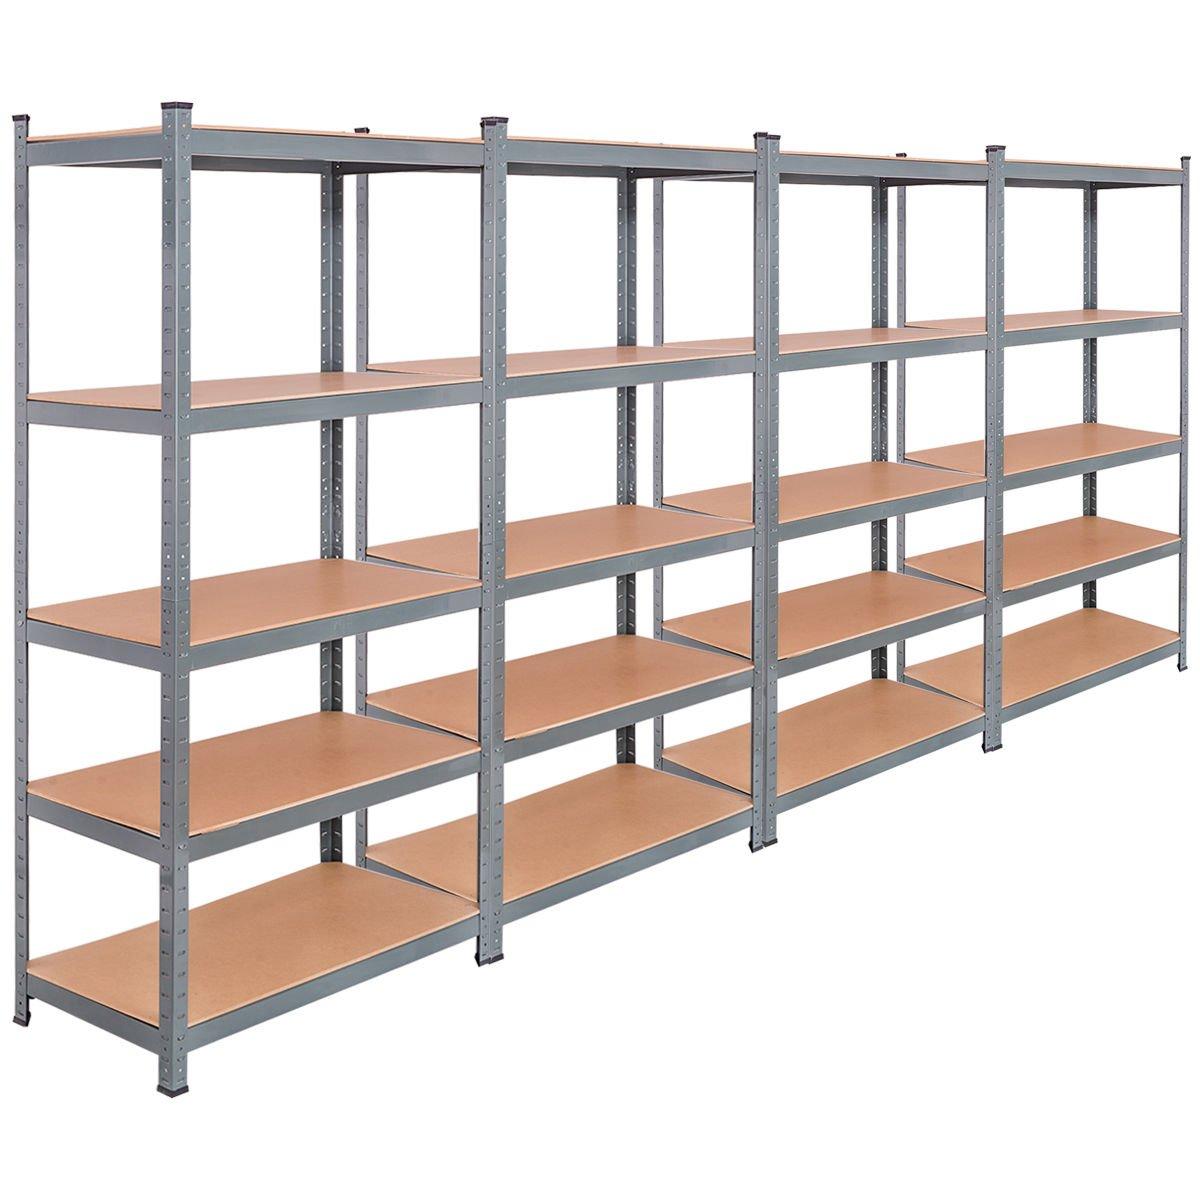 Tangkula 72 Storage Shelves Heavy Duty Steel Frame 5-Tier Garage Shelf Metal Multi-Use Storage Shelving Unit for Home//Office//Dormitory//Garage